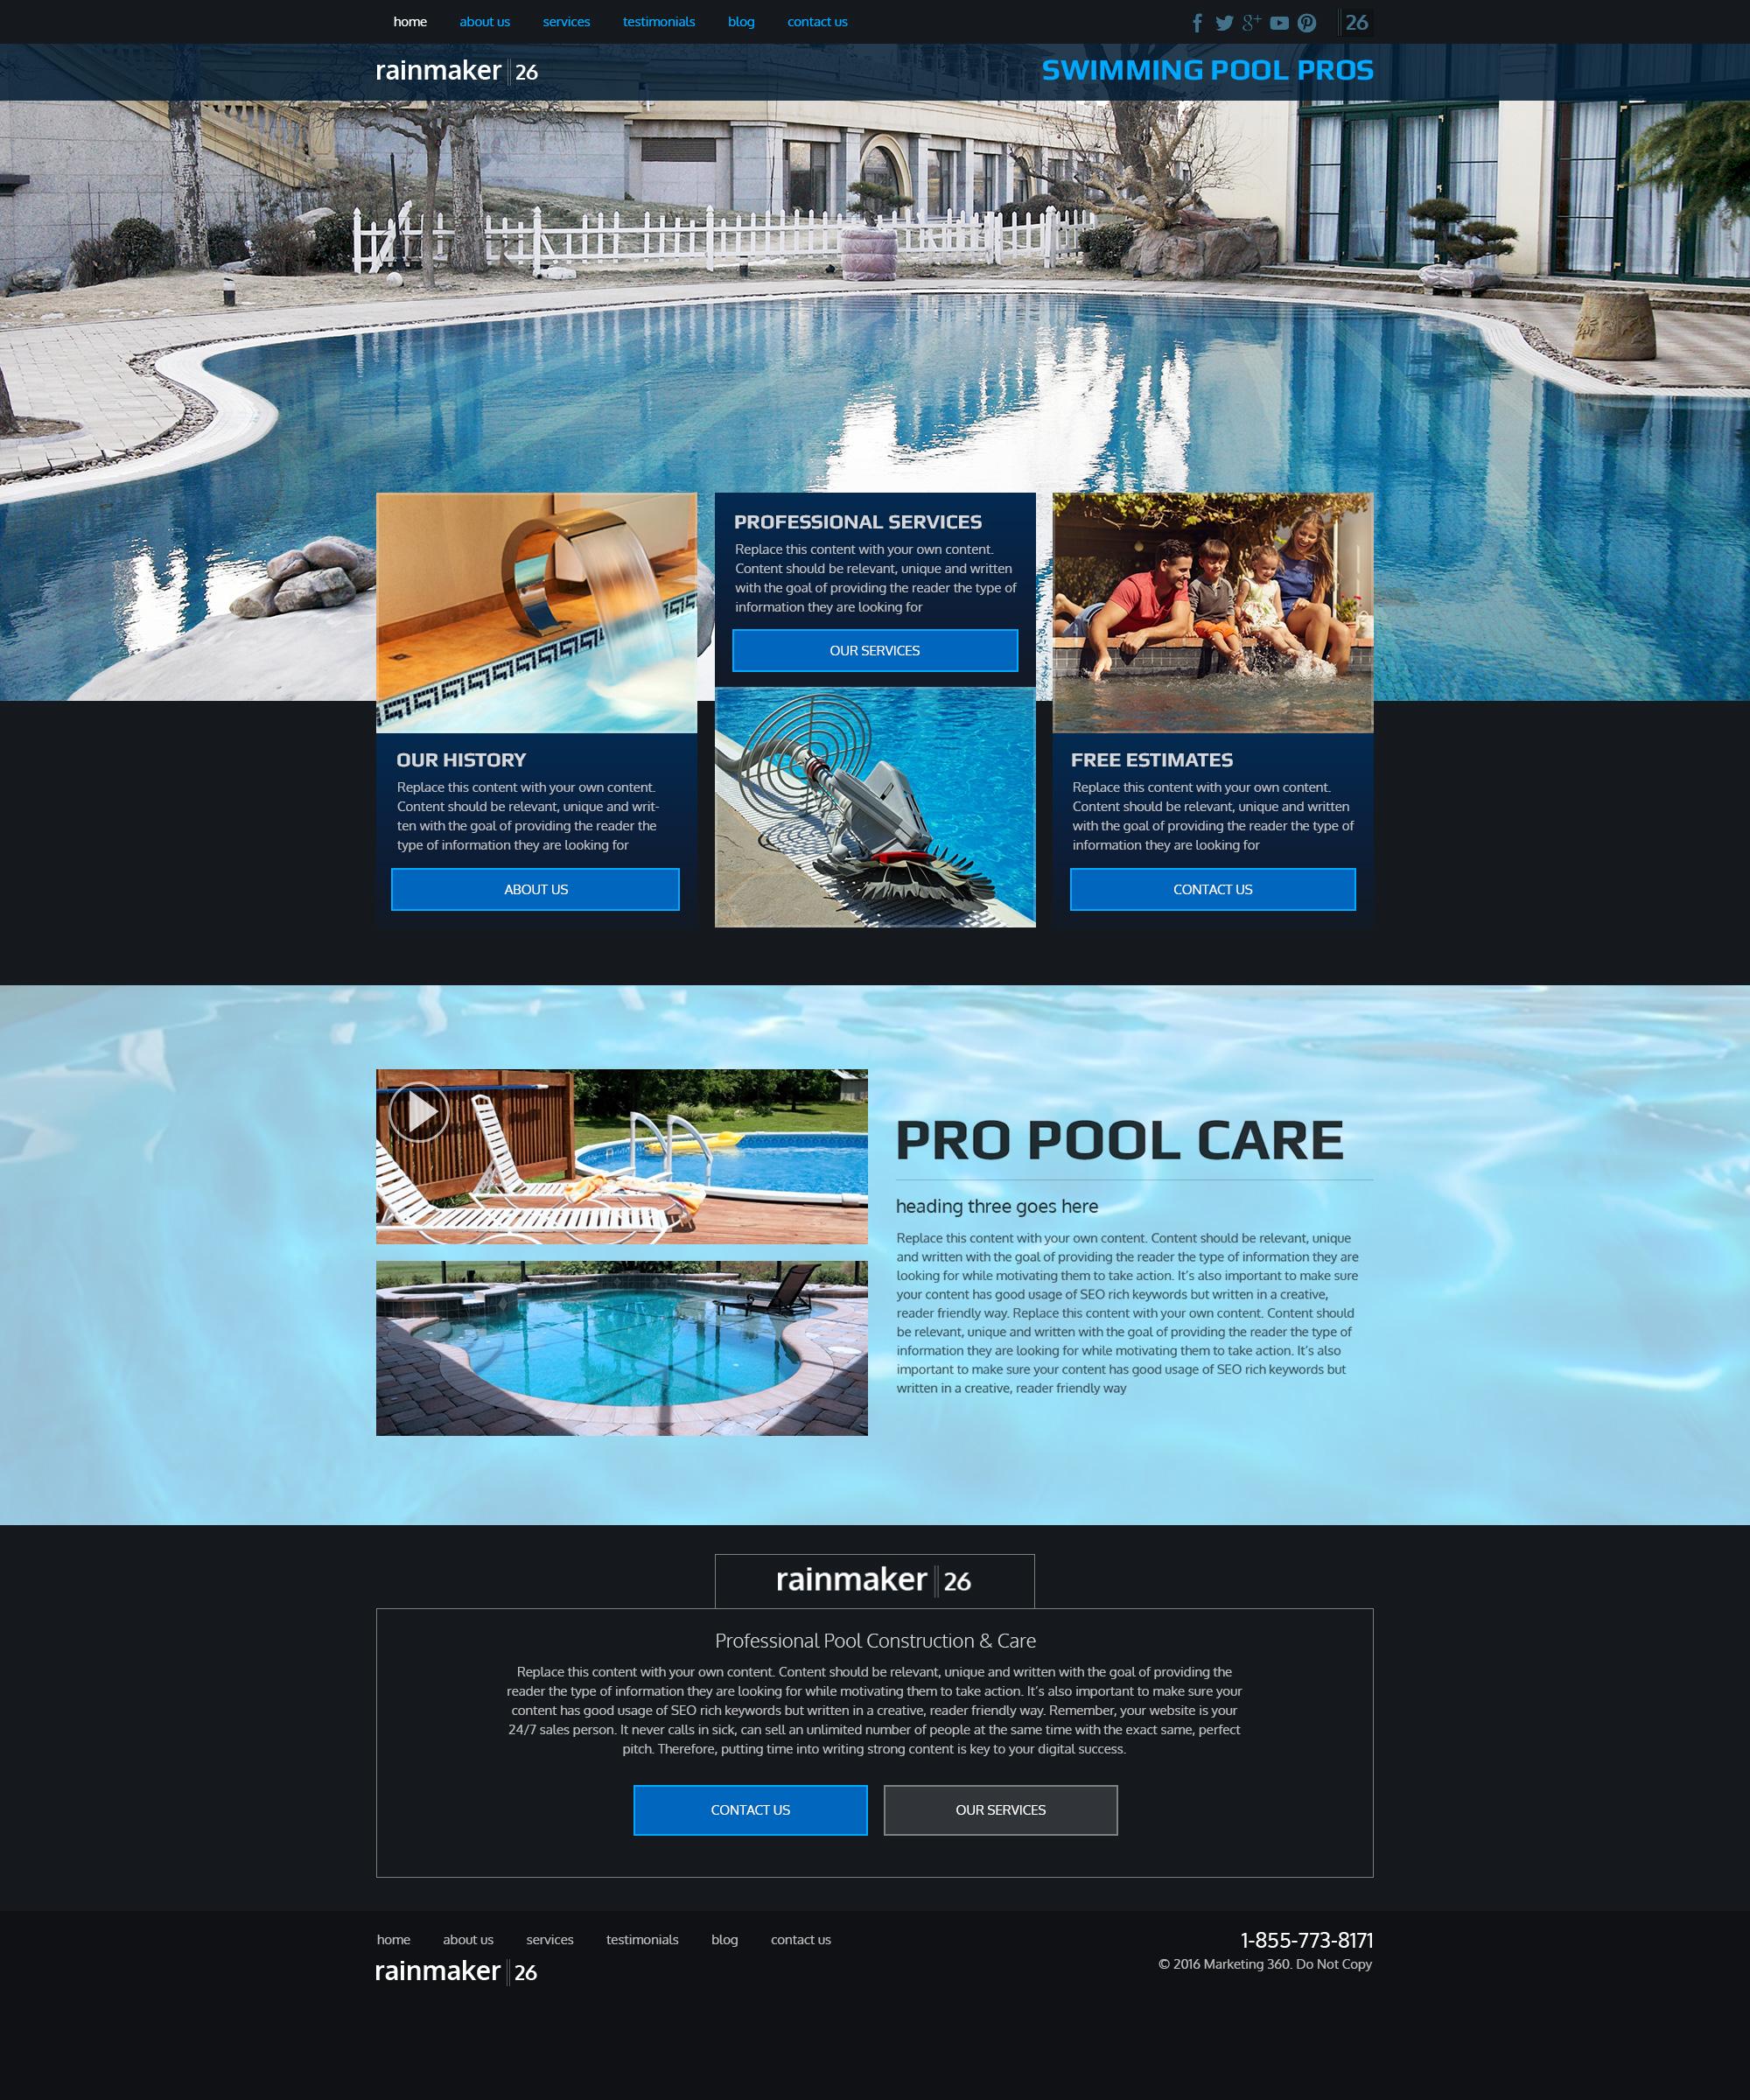 Design A Pool Online For Free design rm26060 Design Rm26060